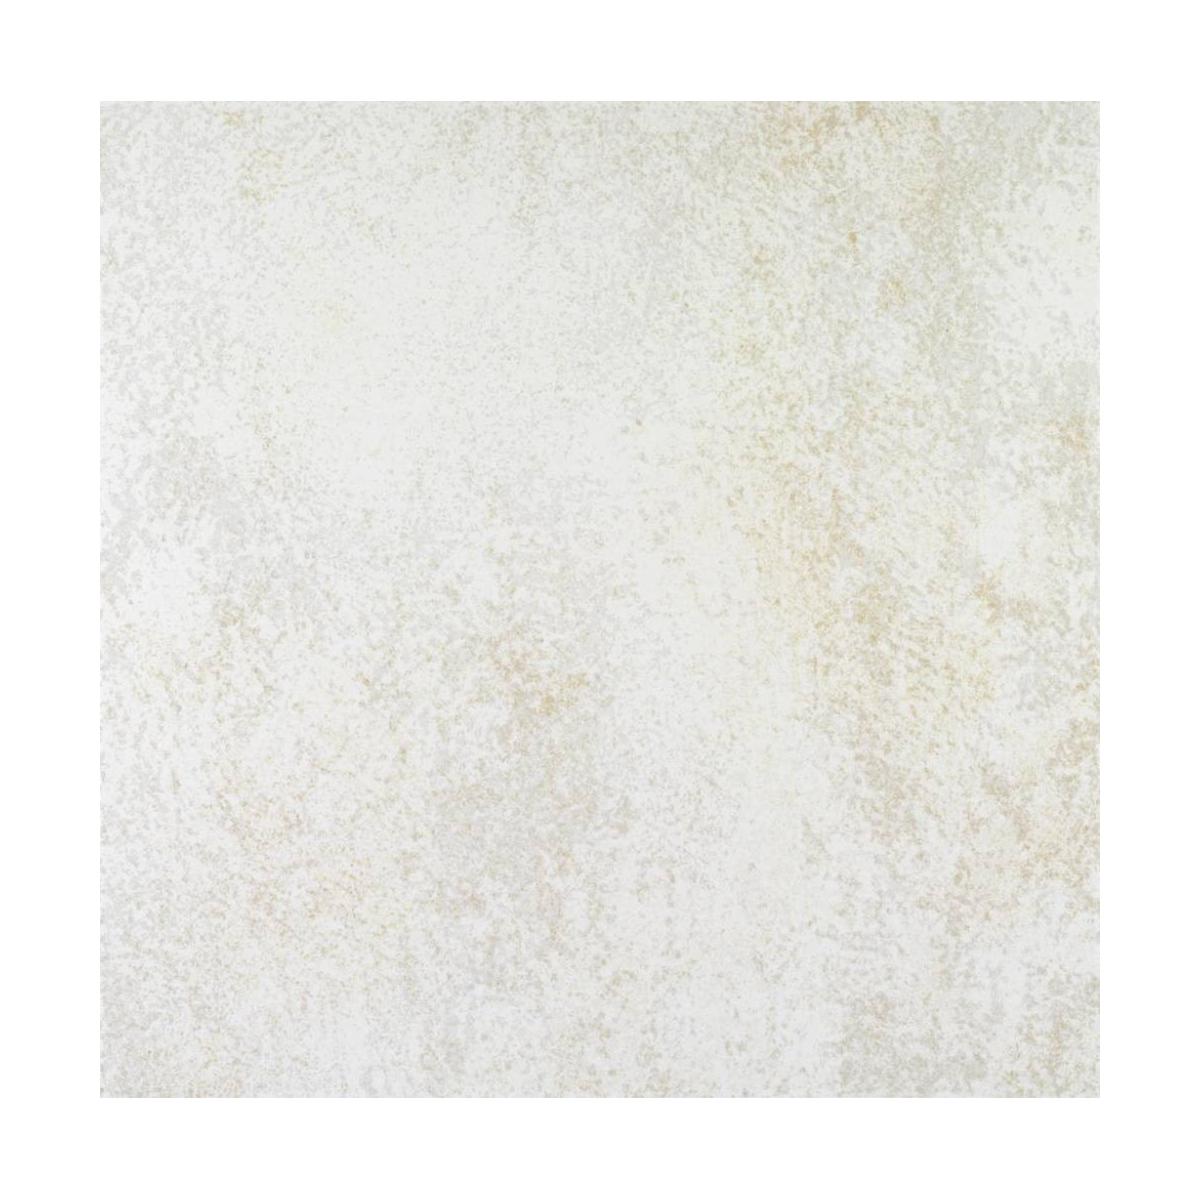 Cronos Blanco - Imitación Metal - Marca Grespania